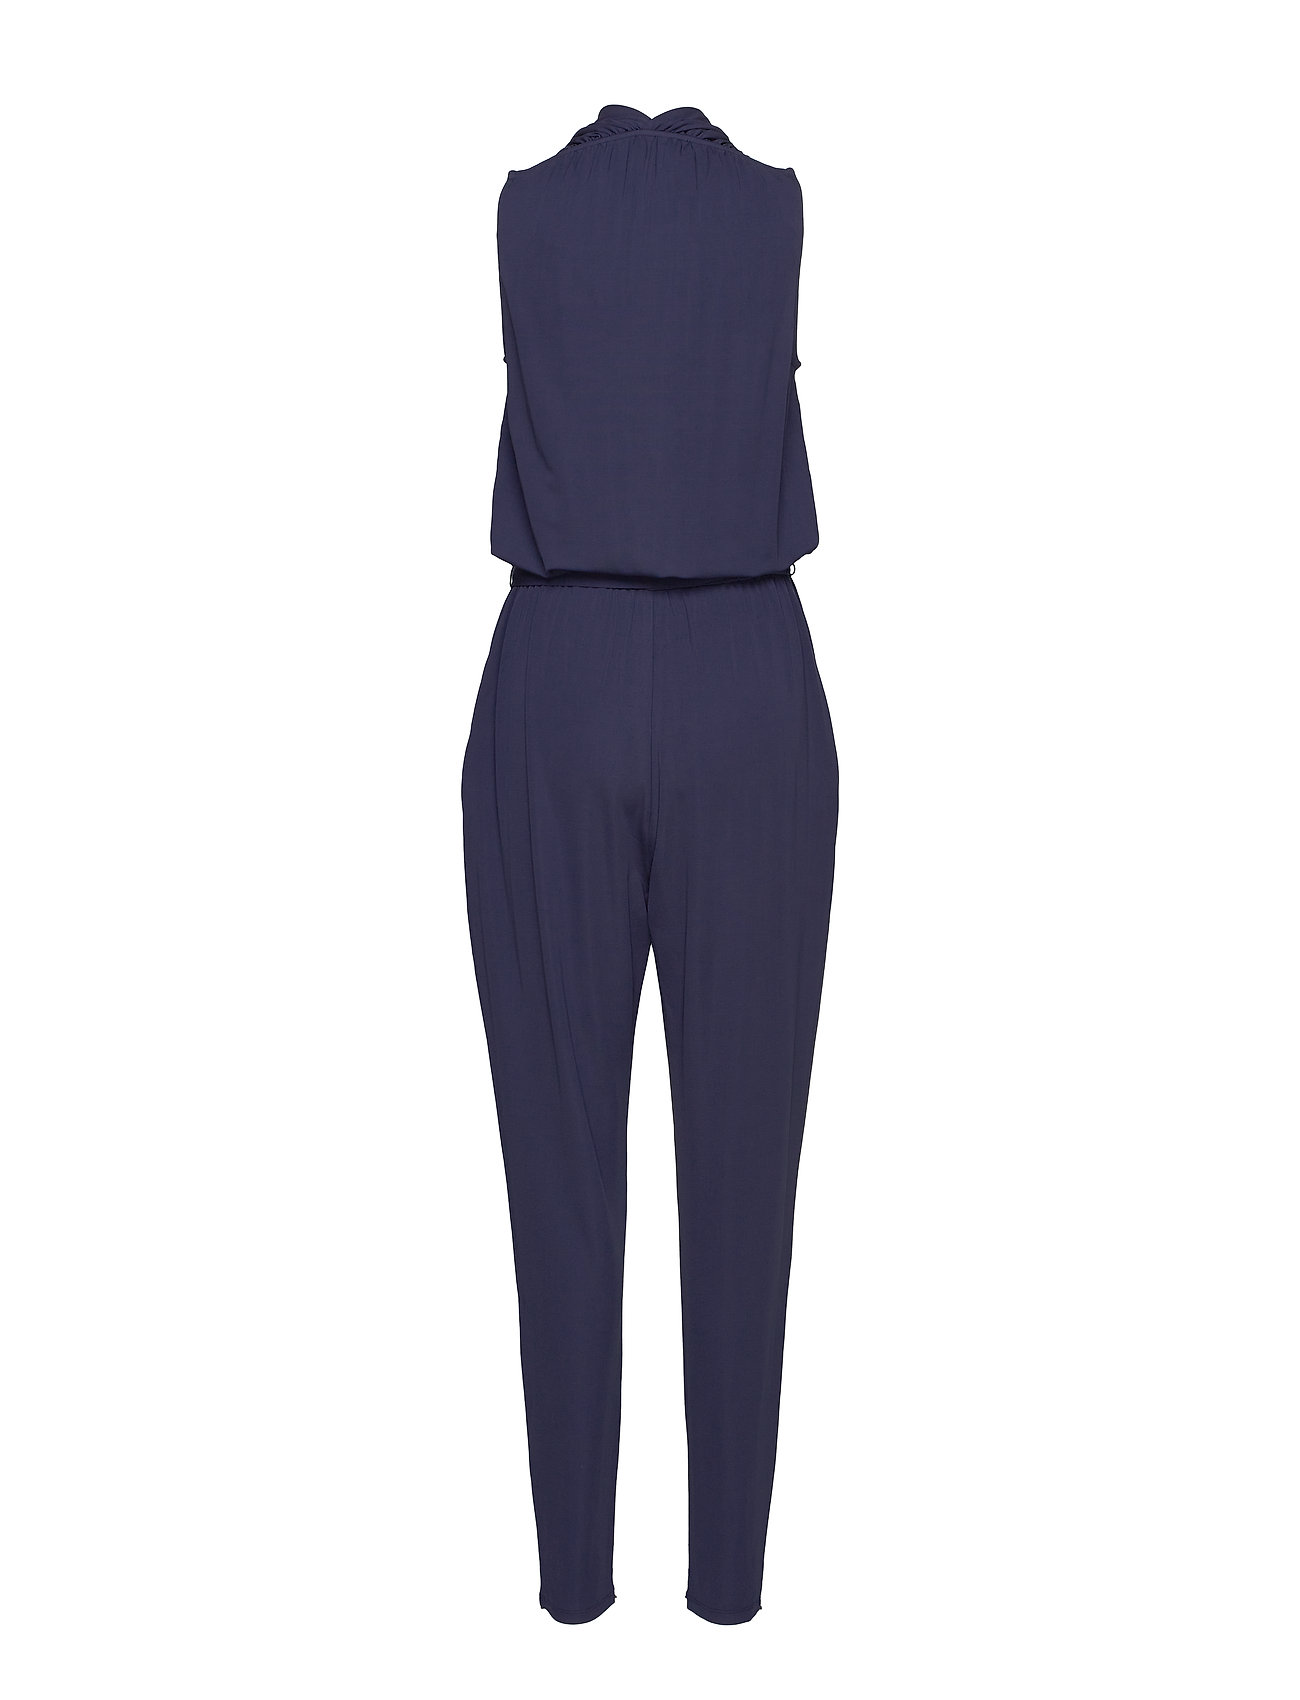 Michael Kors Elv Sl Belt Jmpst - Jumpsuits